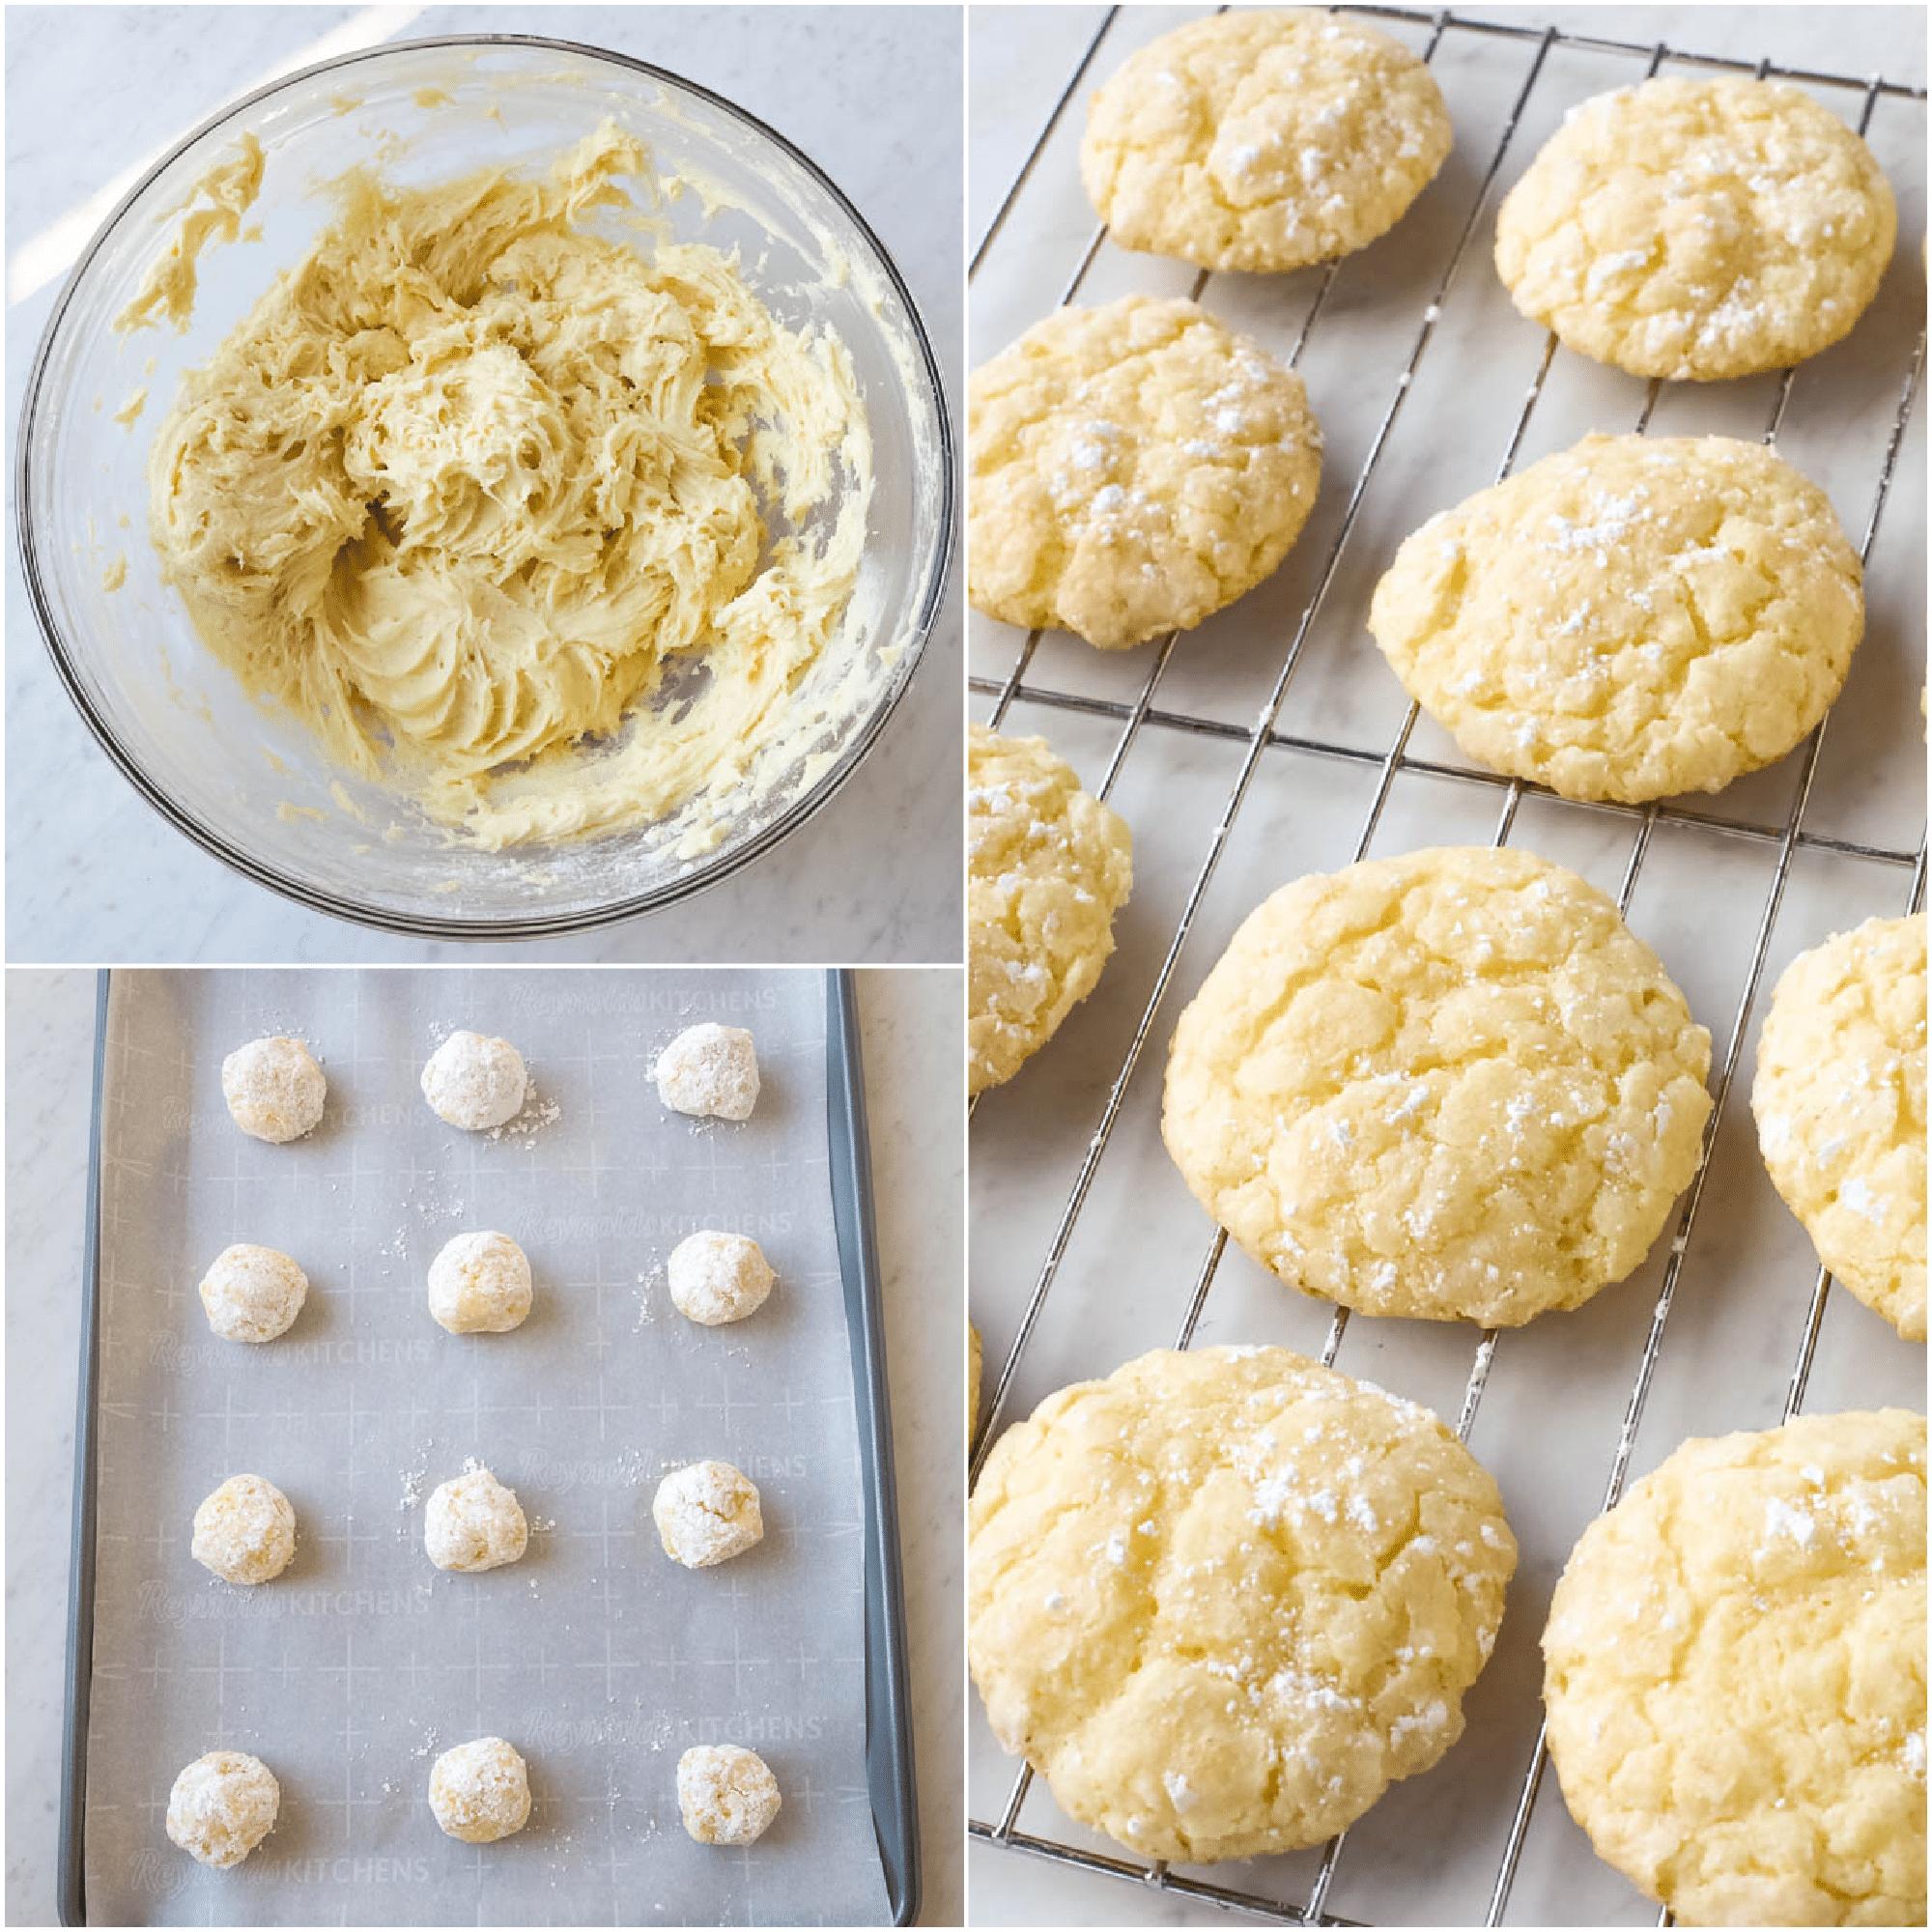 steps to make cake mix cookies